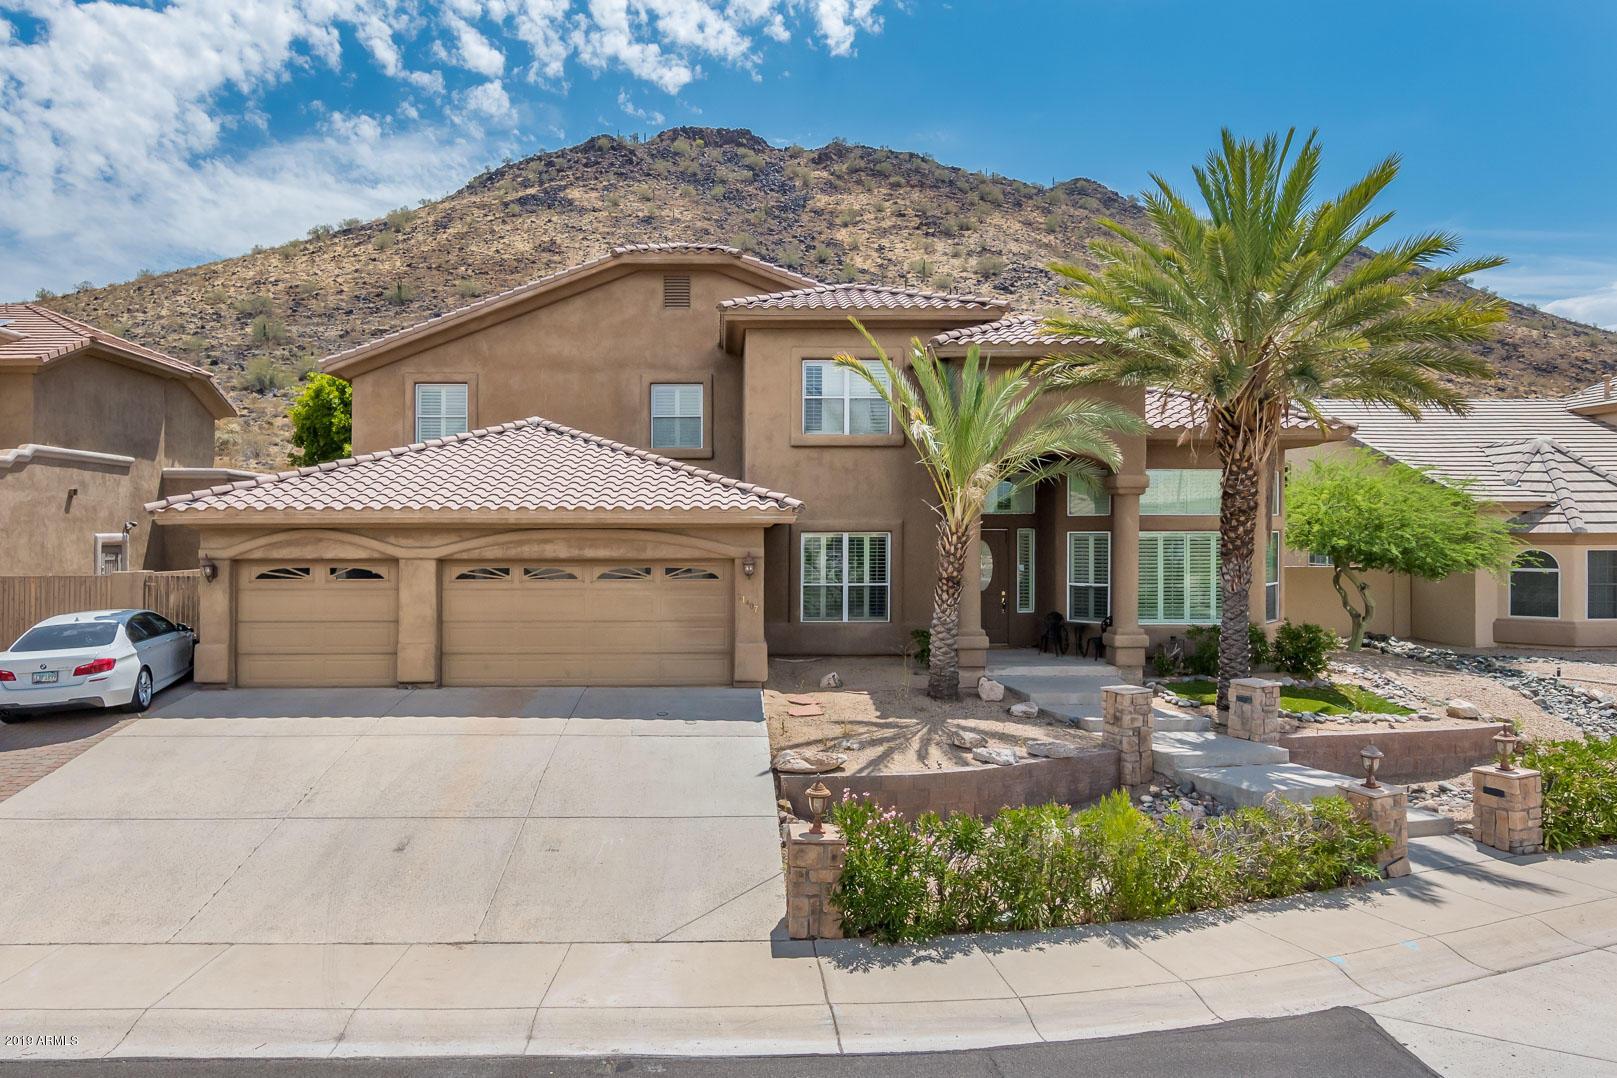 21407 N 52ND Avenue, Glendale AZ 85308